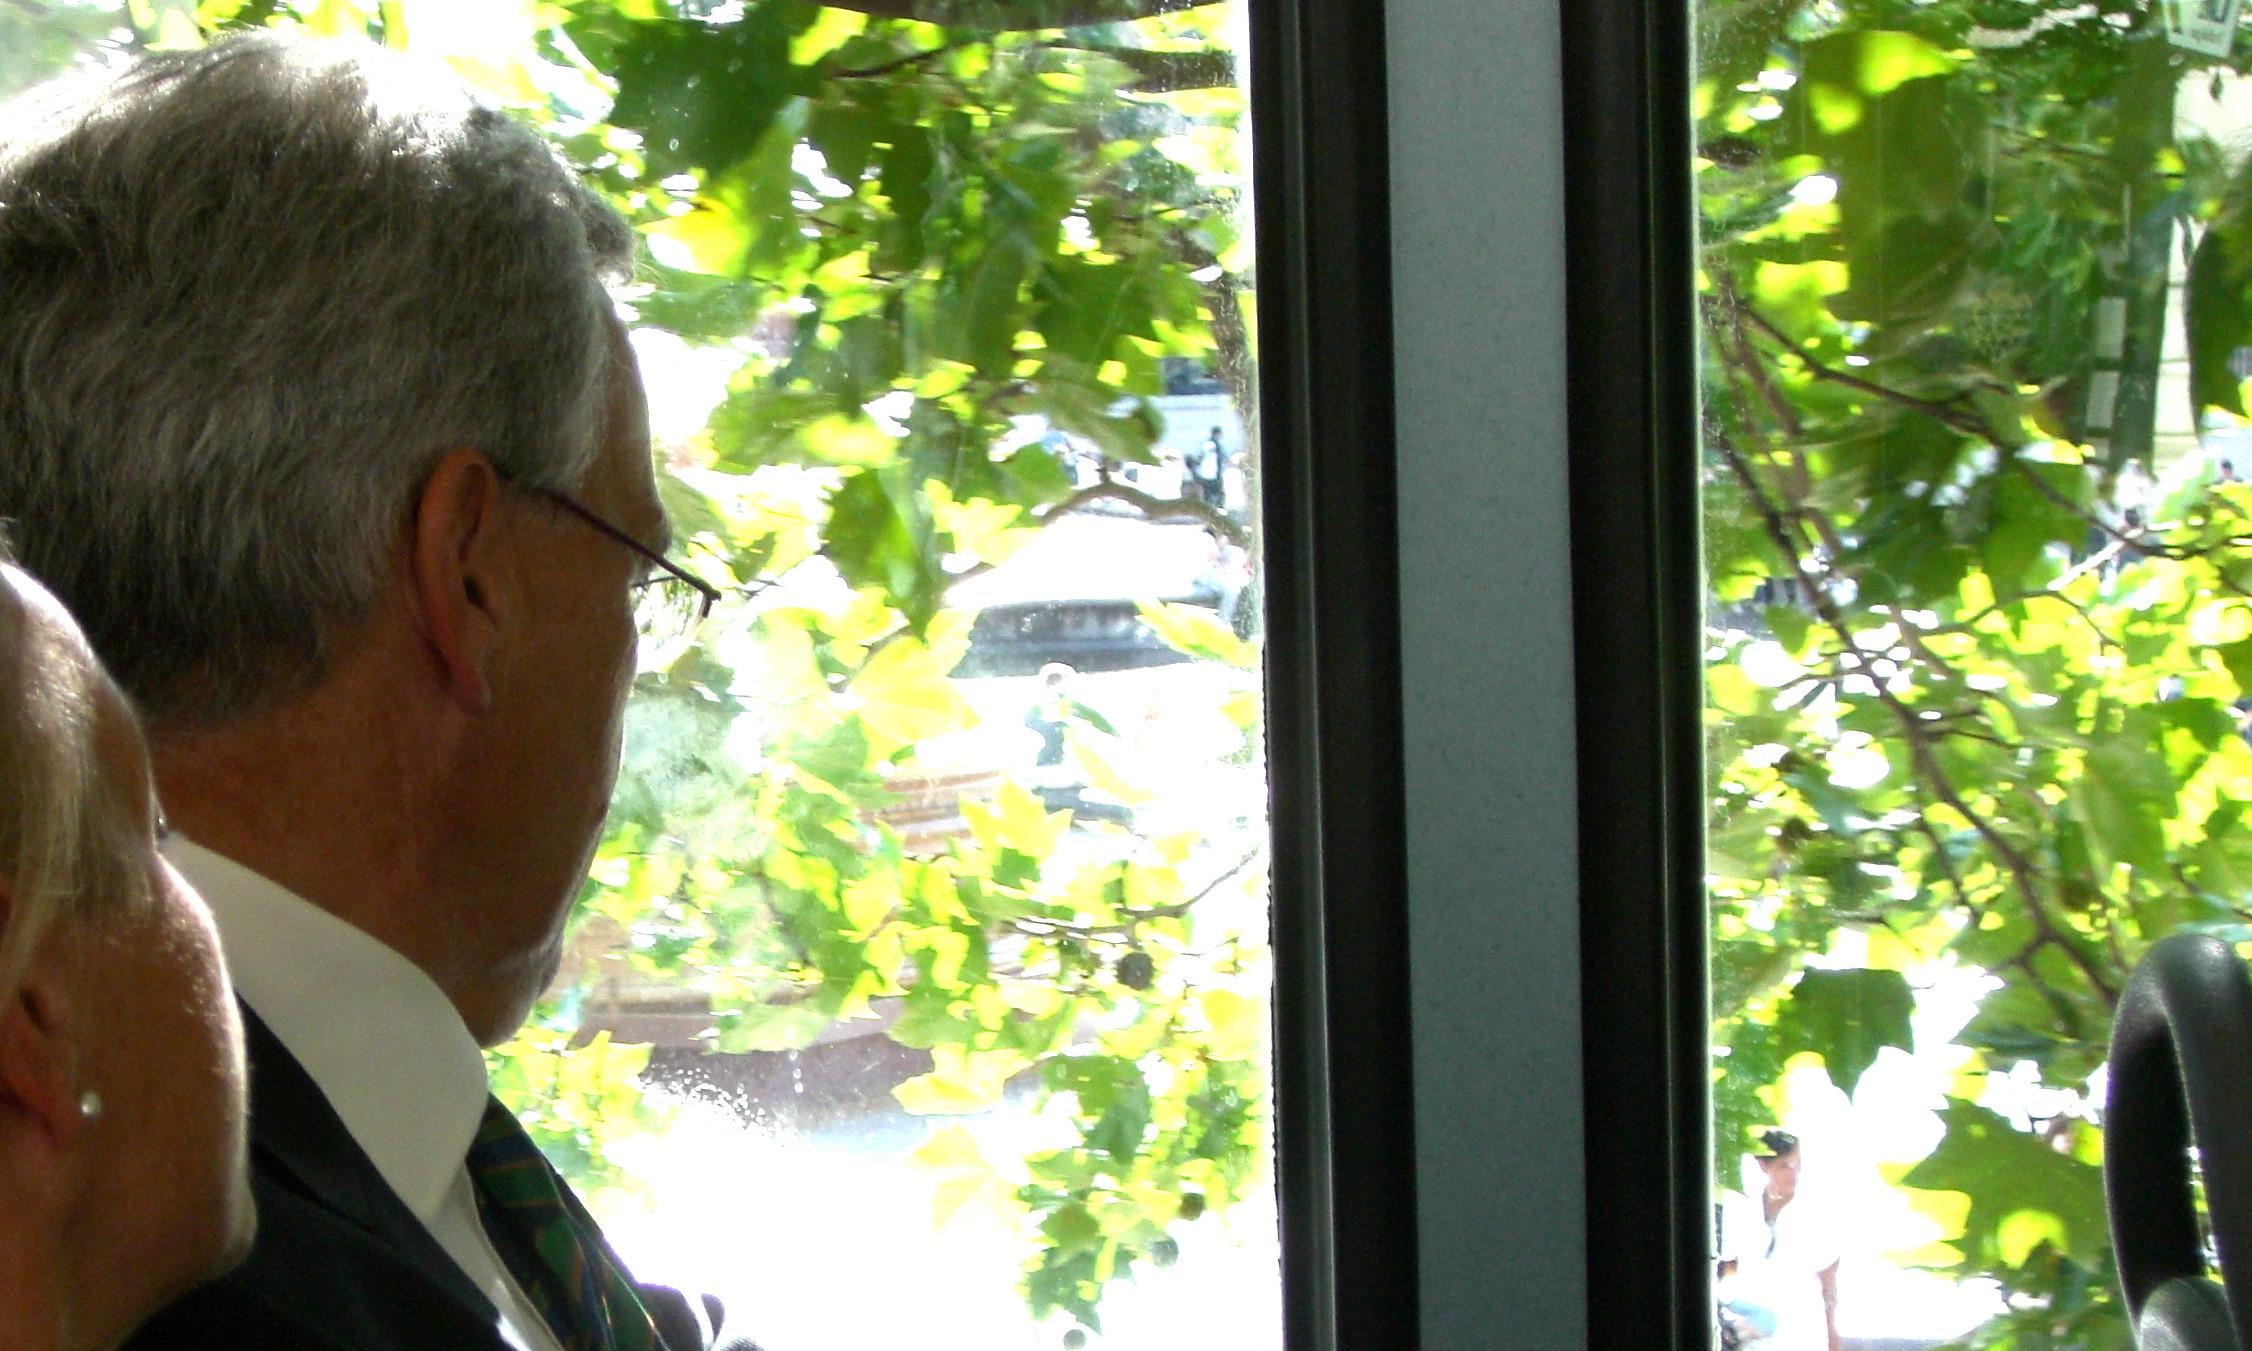 Beobachtung am helllichten Tage | story.one